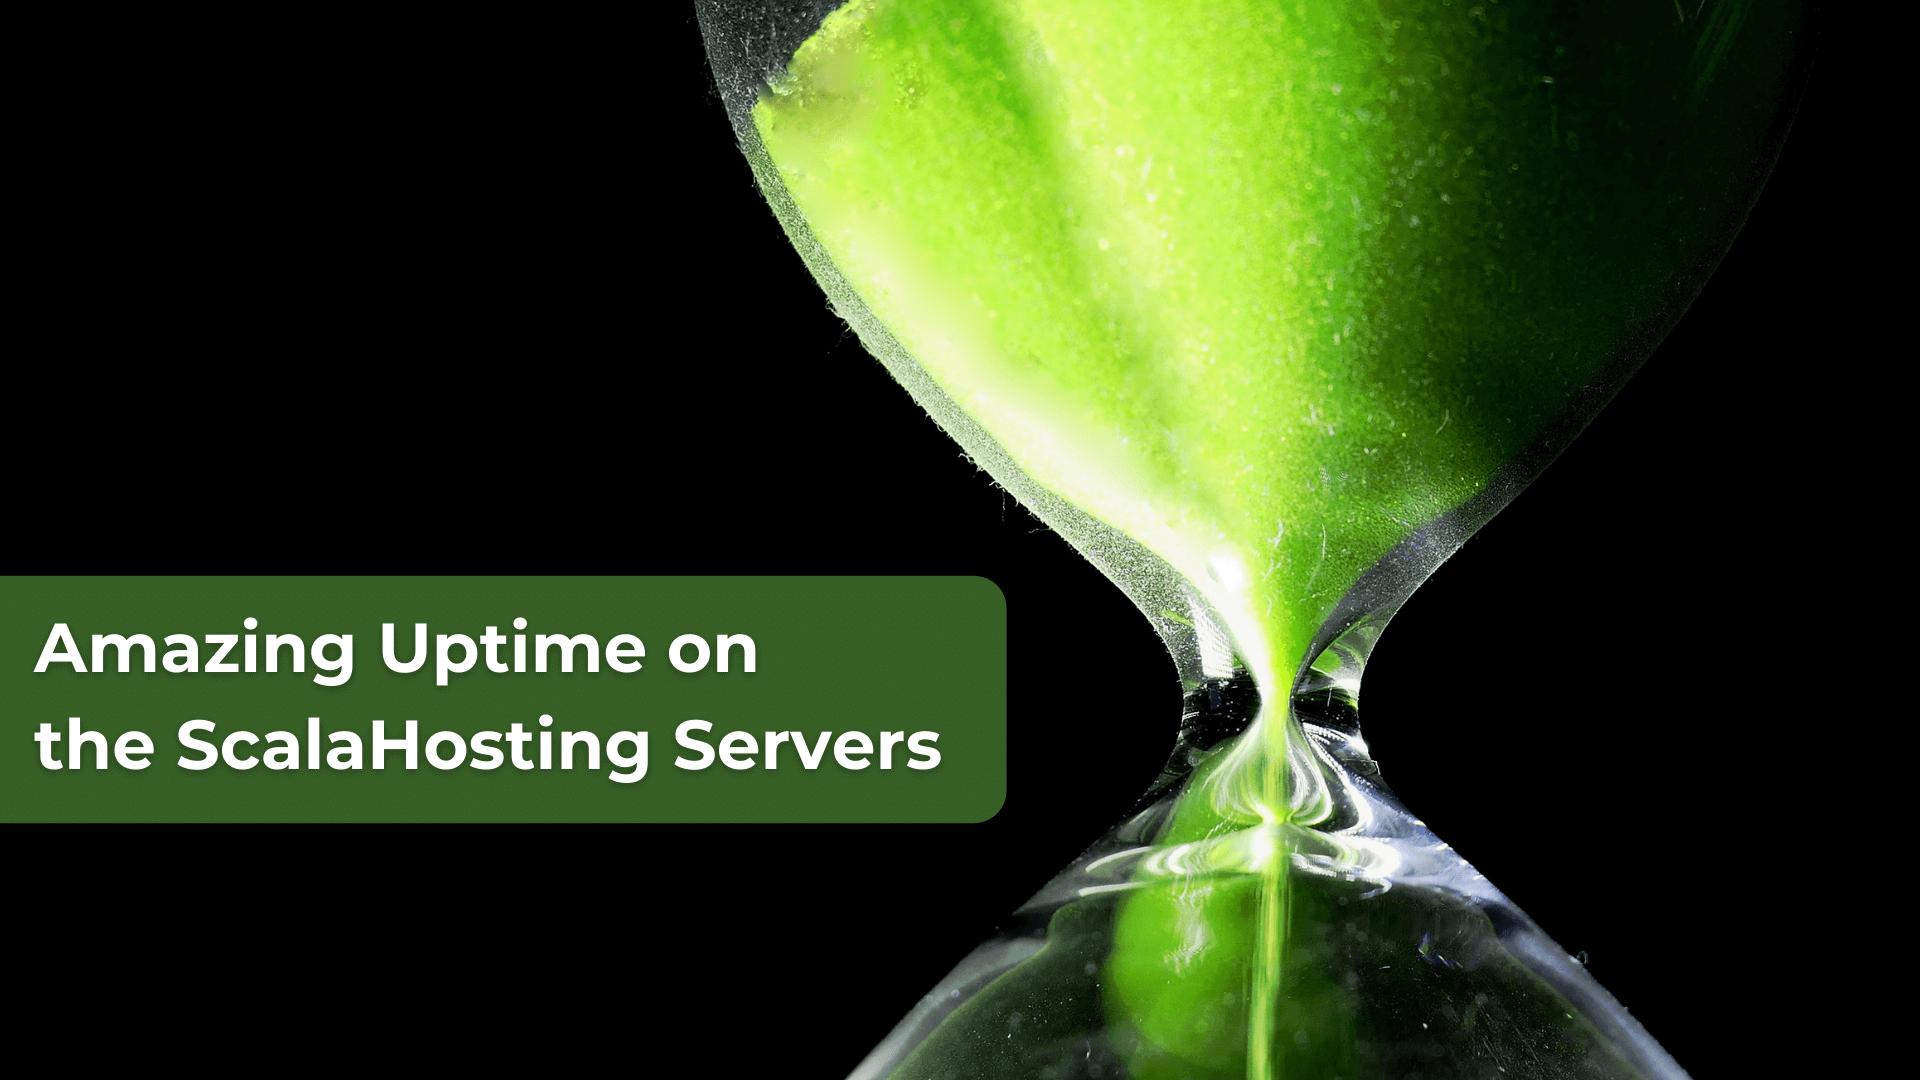 Amazing Uptime on the ScalaHosting Servers